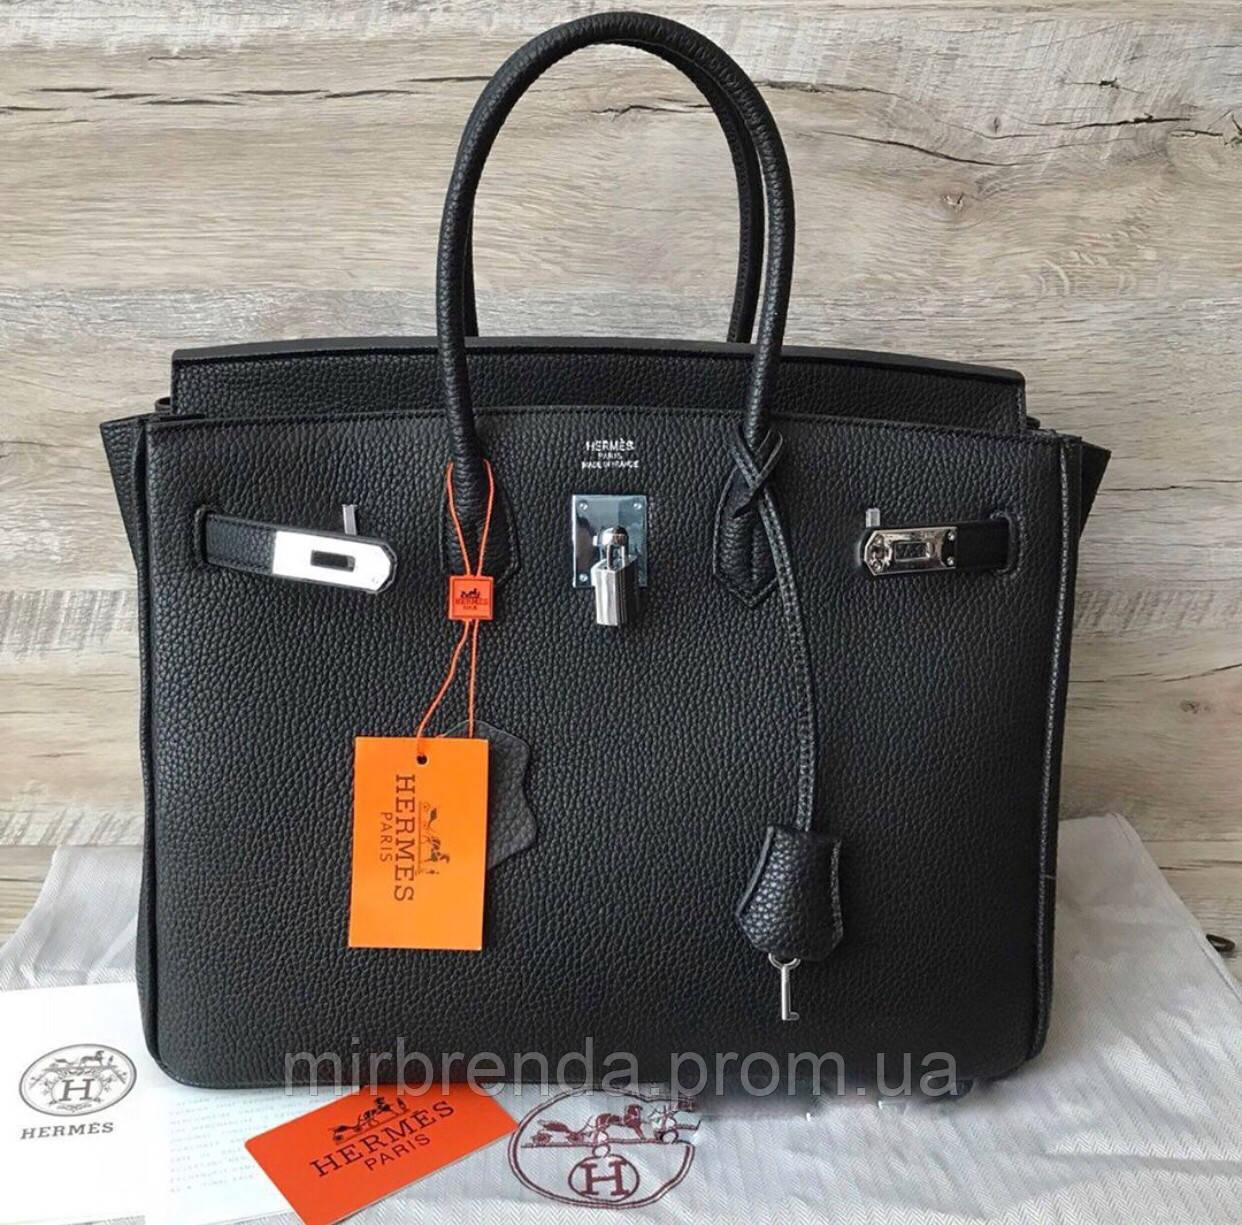 a5f45195536c Брендовые сумки Hermes люкс копия, класс ААА. черная, красная, серая ...